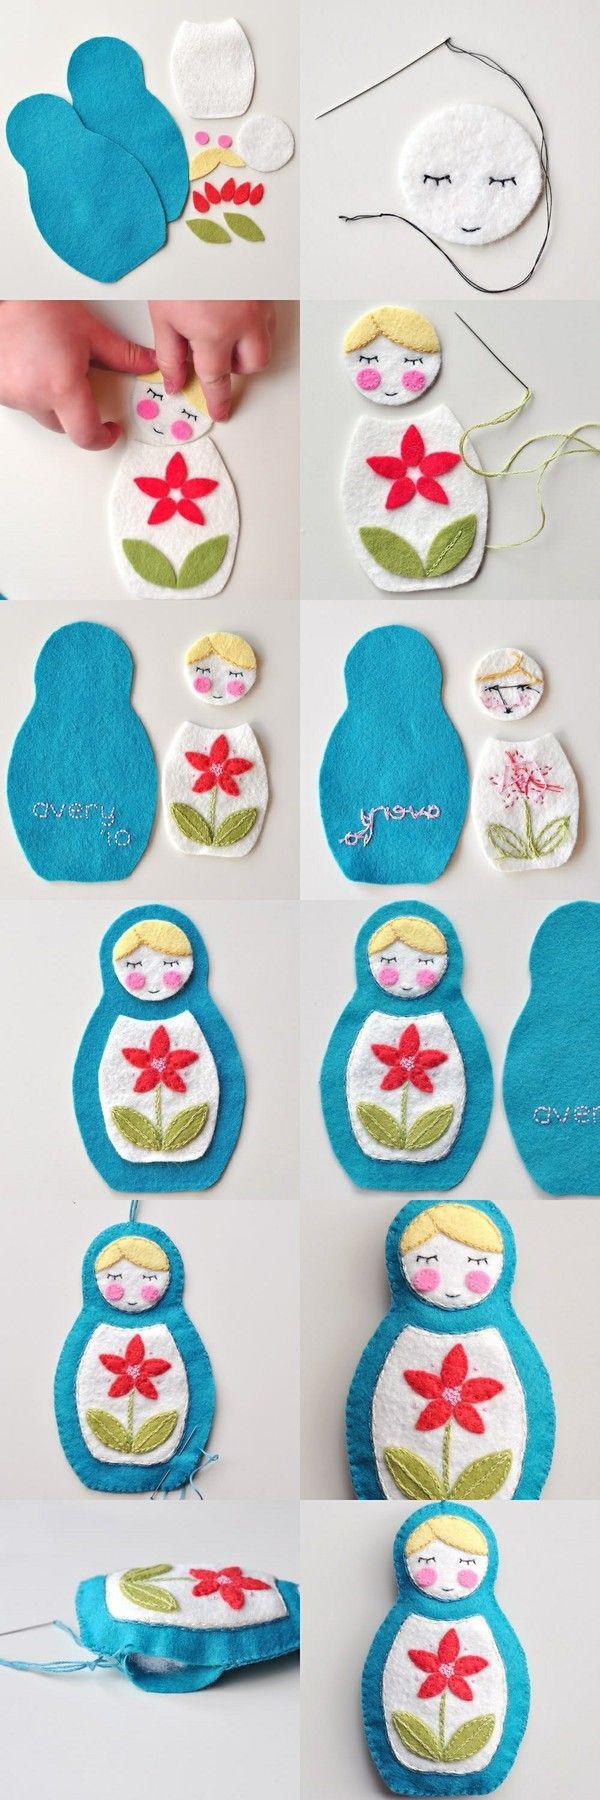 free felt matryoshka babushka russian nesting doll sewing